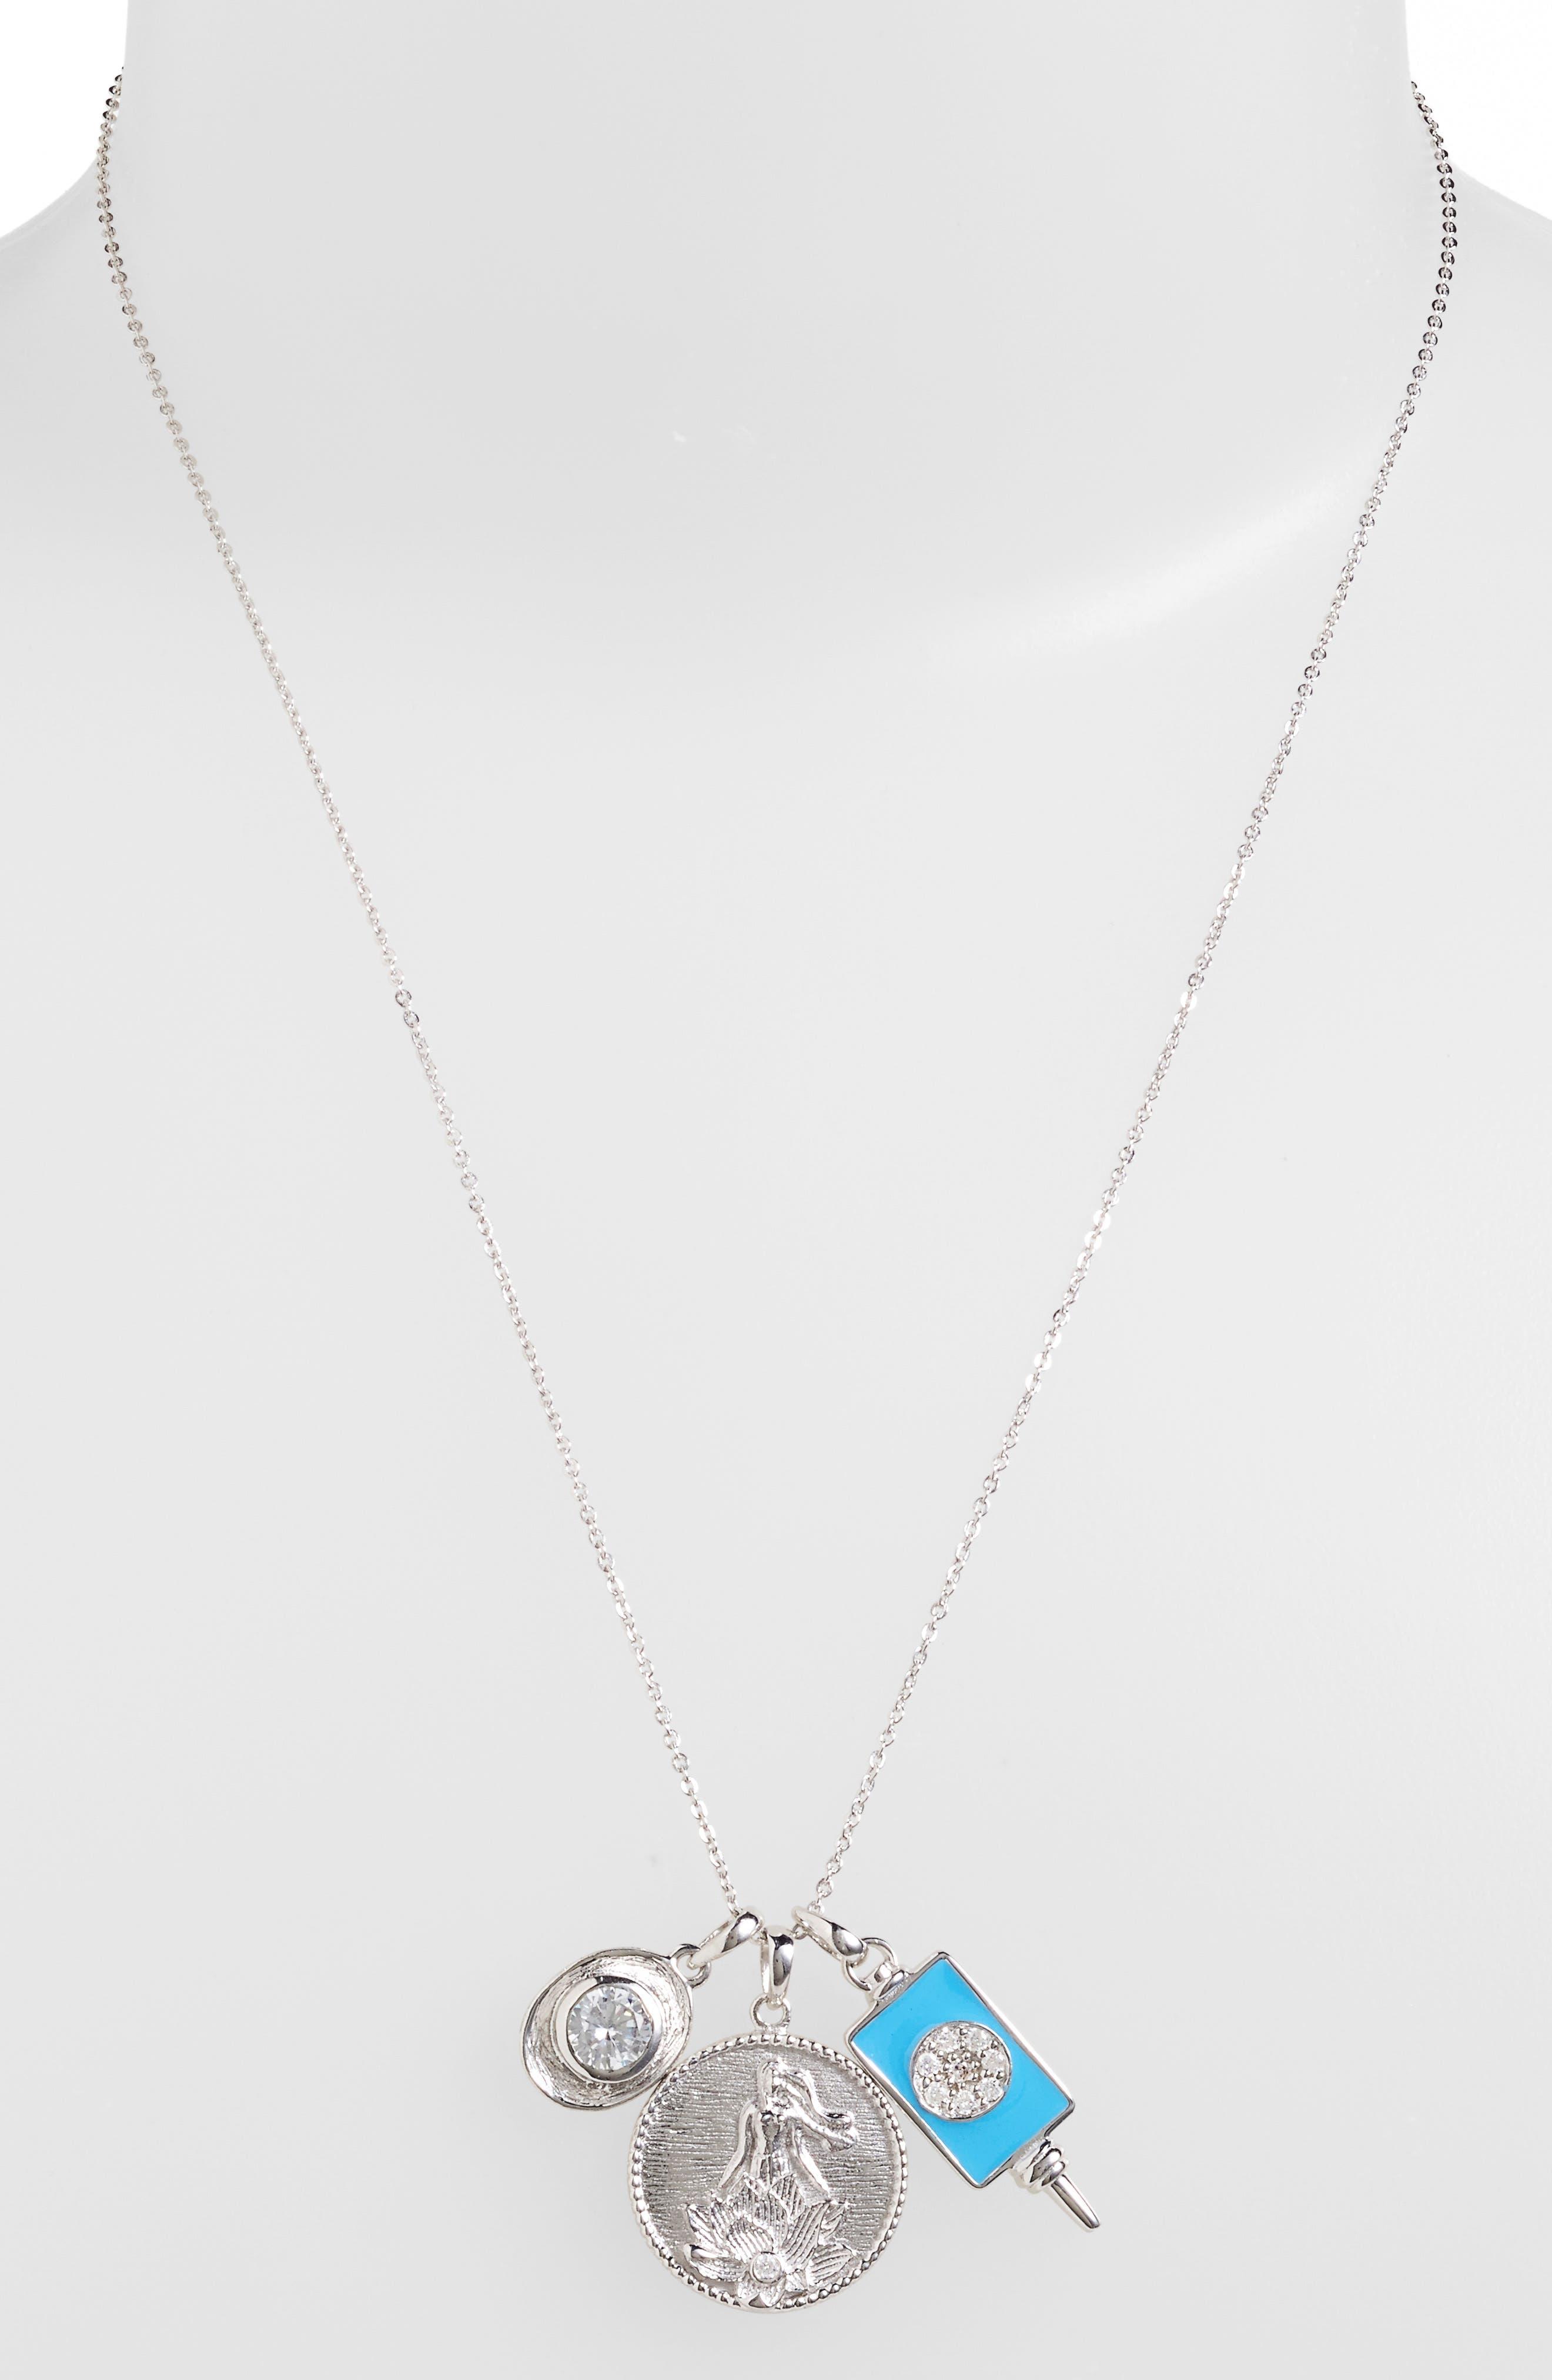 Goddess of Good Fortune Cluster Pendant Necklace,                             Alternate thumbnail 3, color,                             040